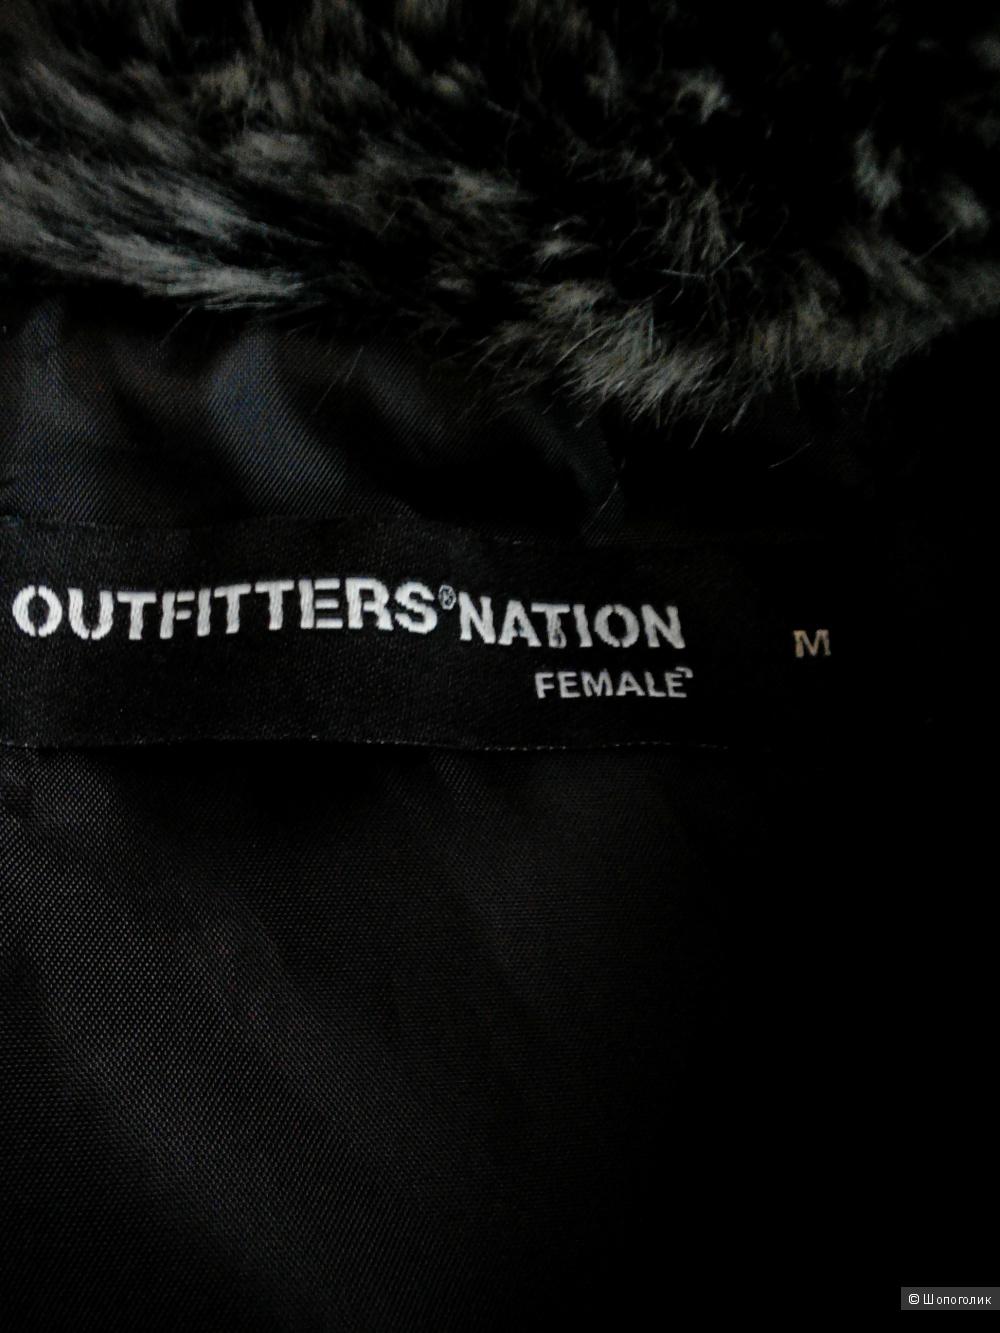 Меховой жилет. Outfitters nation. 44-46(M)